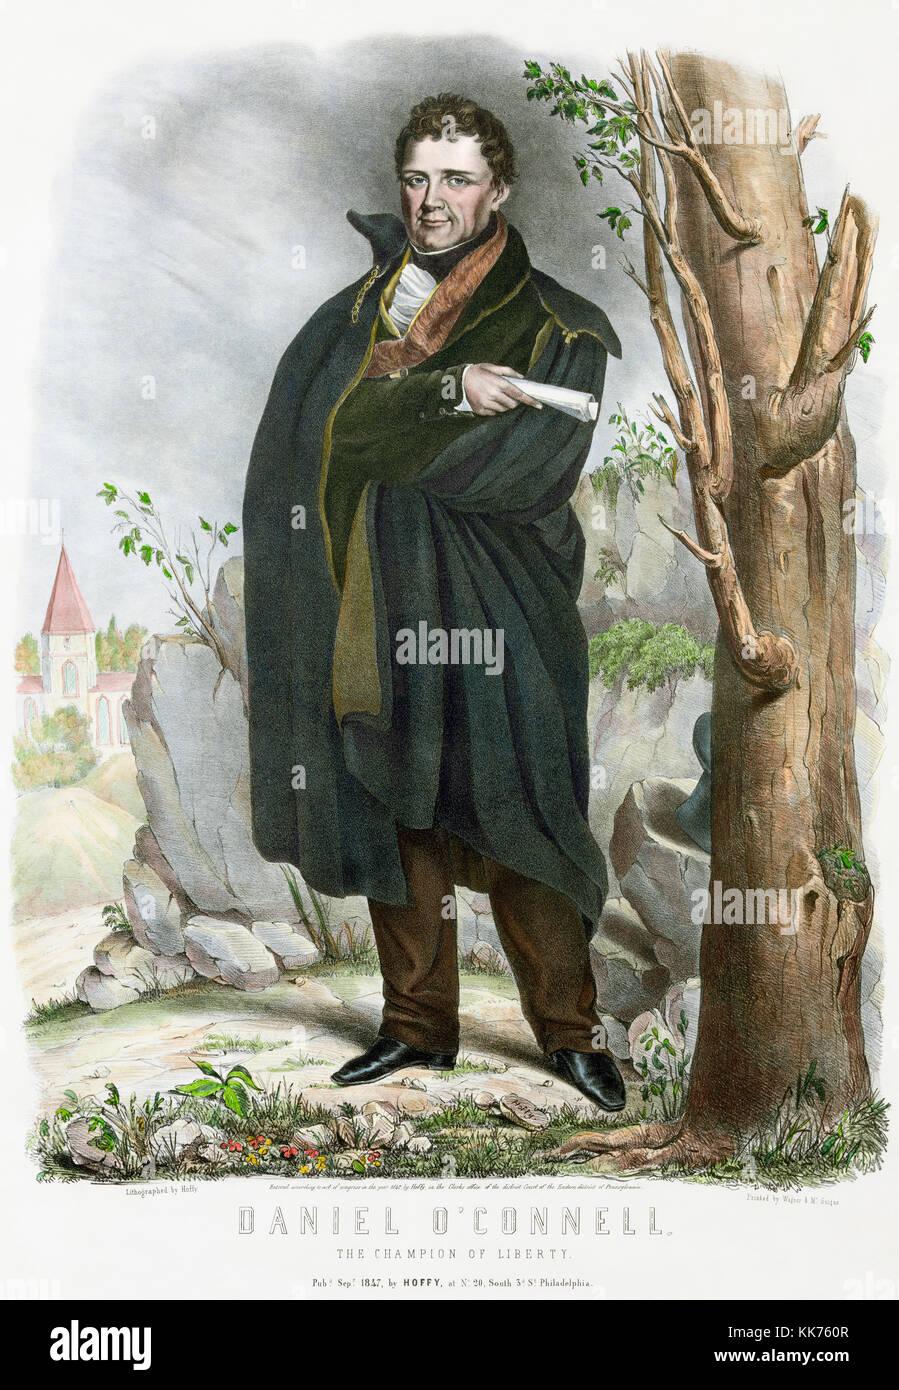 Daniel O'Connell, 1775 – 1847, aka The Liberator or The Emancipator. Irish political leader. - Stock Image